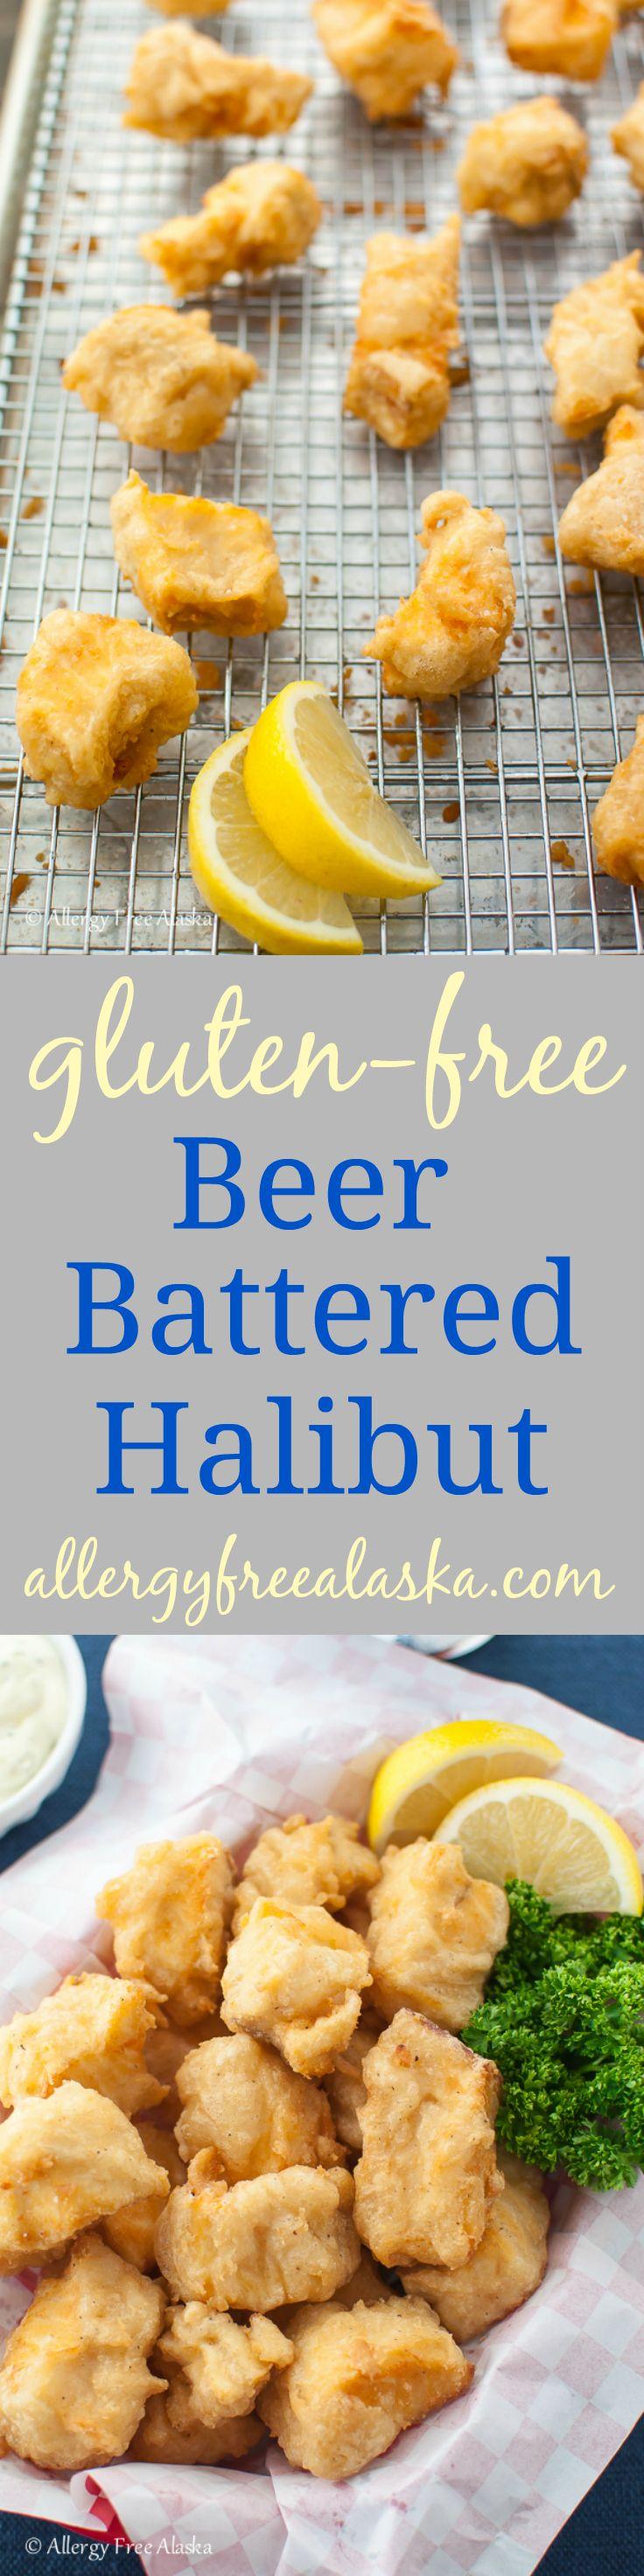 Gluten-Free Beer Battered Halibut Recipe from Allergy Free Alaska